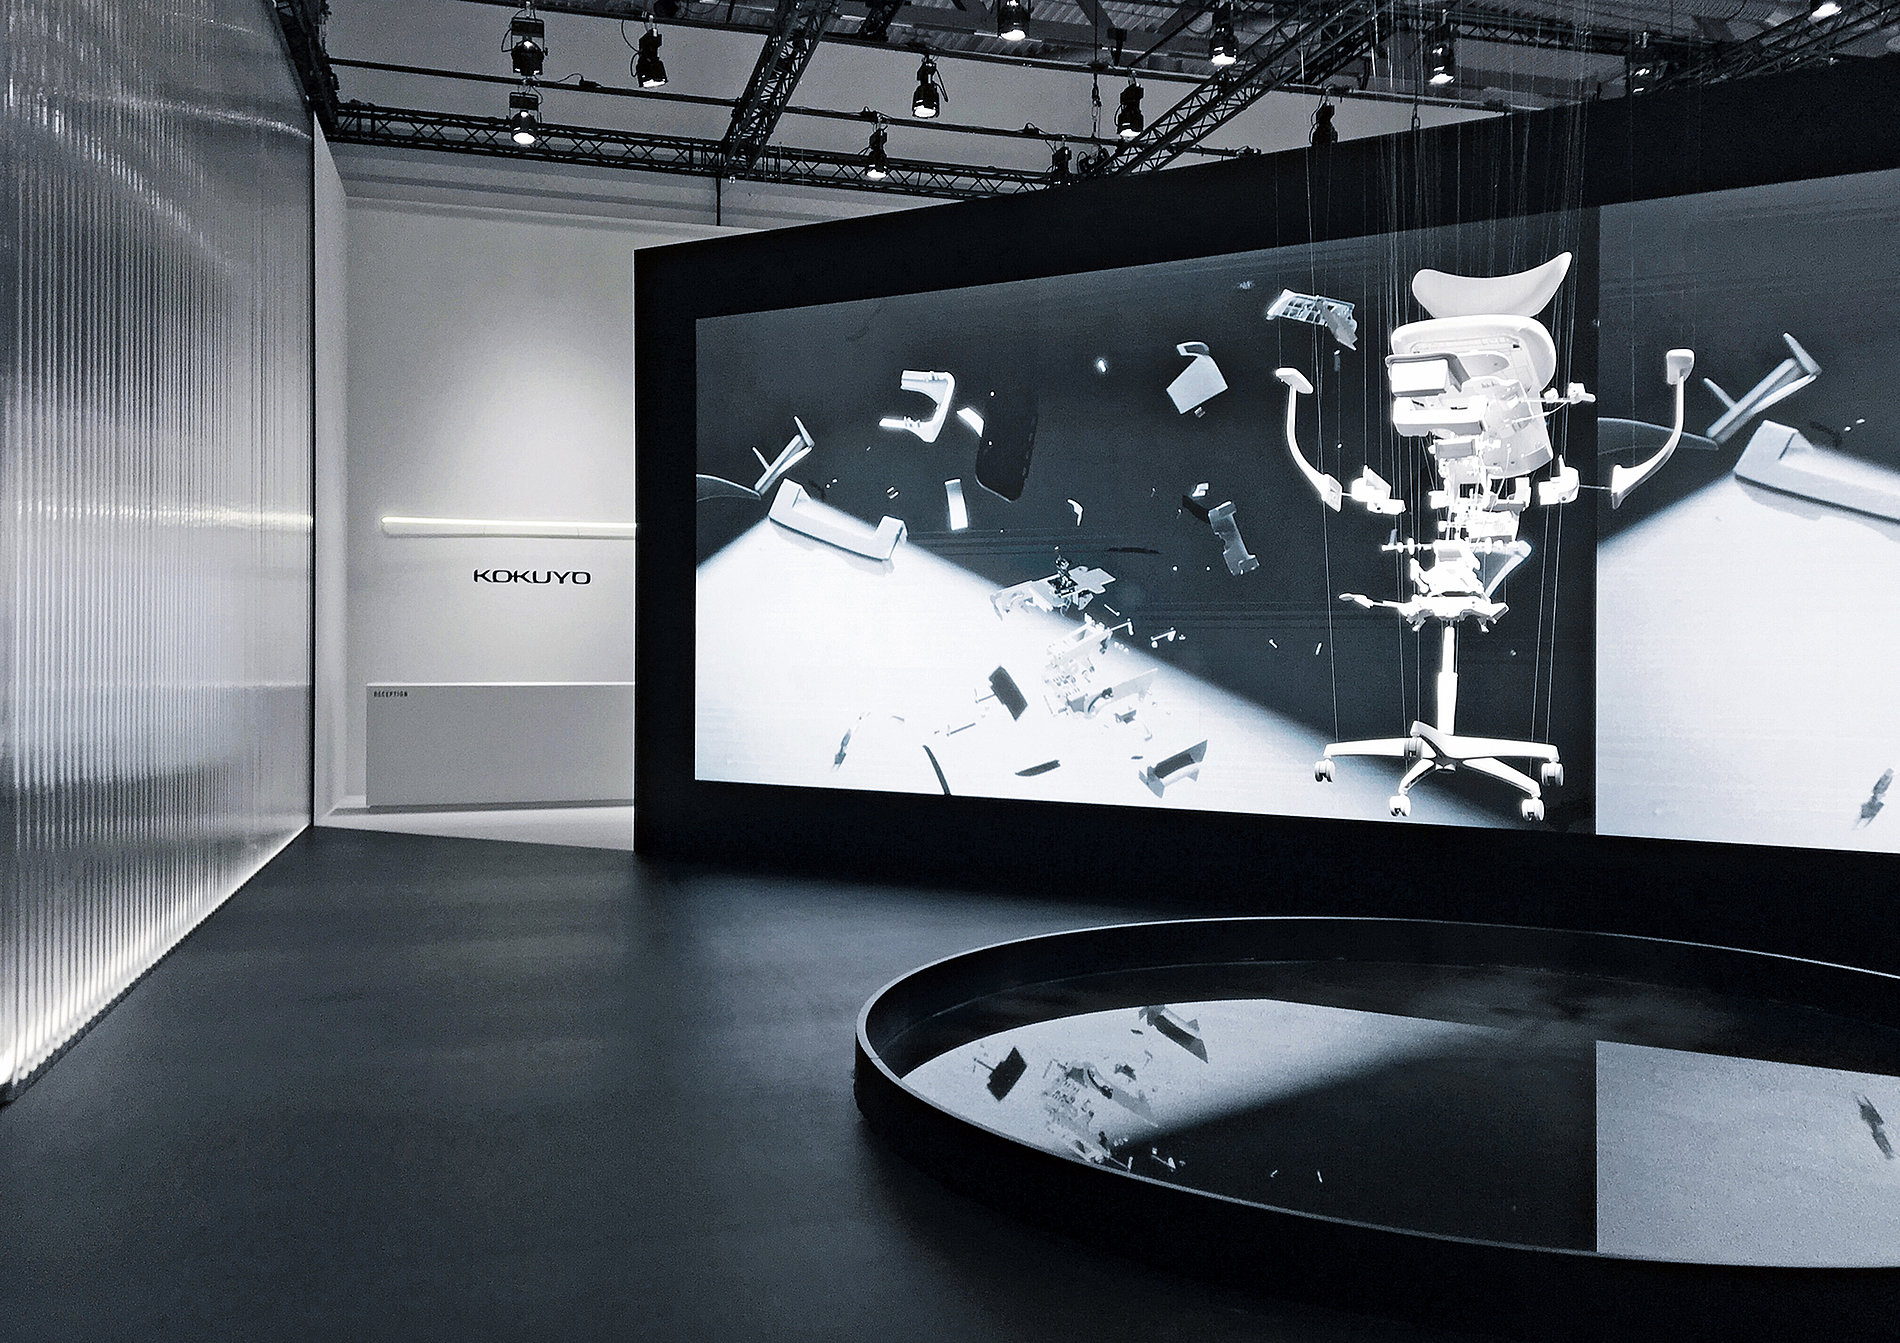 KOKUYO Fair Stand ORGATEC 2018 | Red Dot Design Award